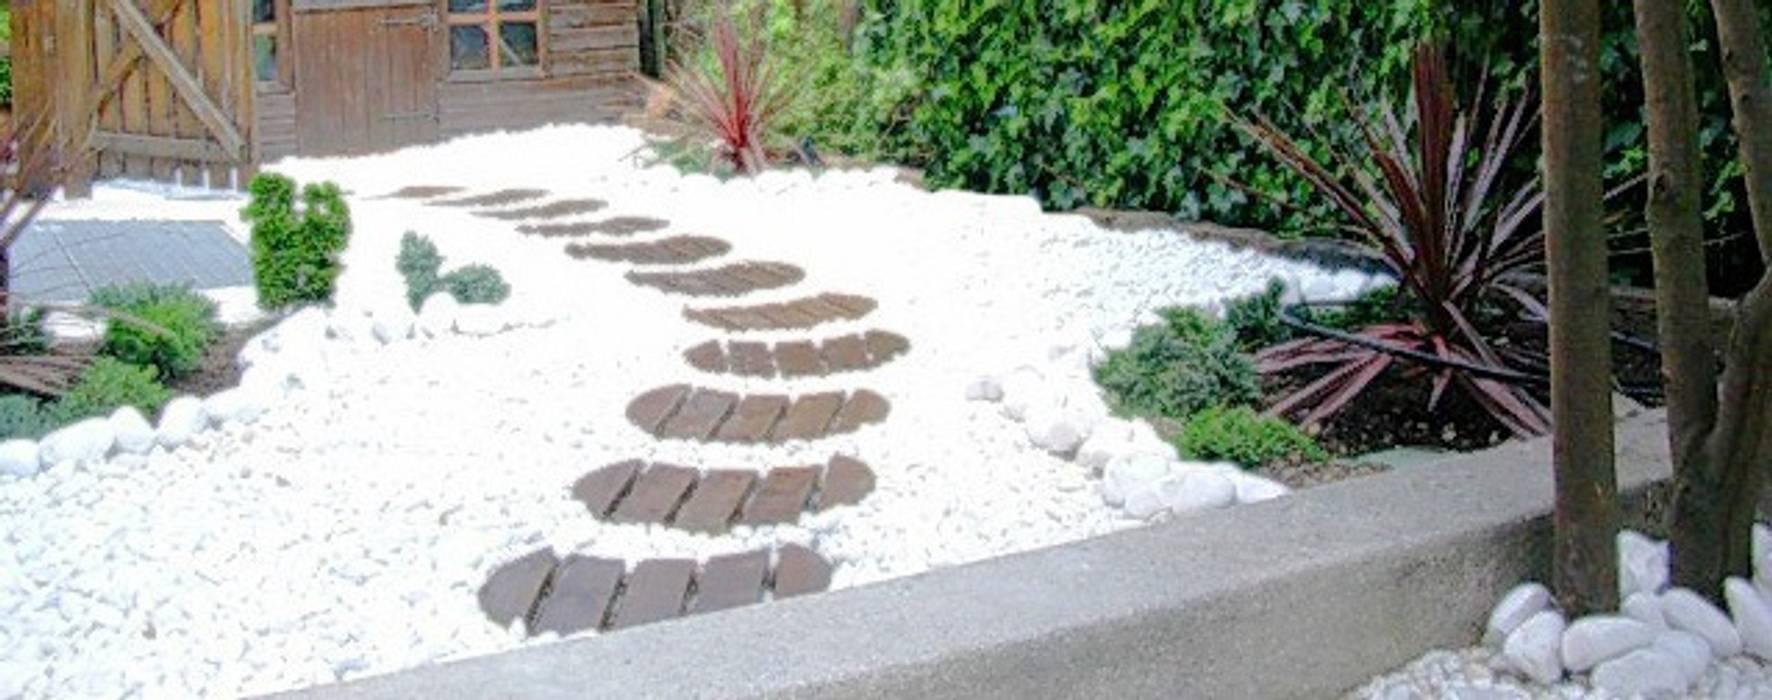 Jardines de piedra de estilo por paisajistas y jardineros homify - Pavimento jardin ...